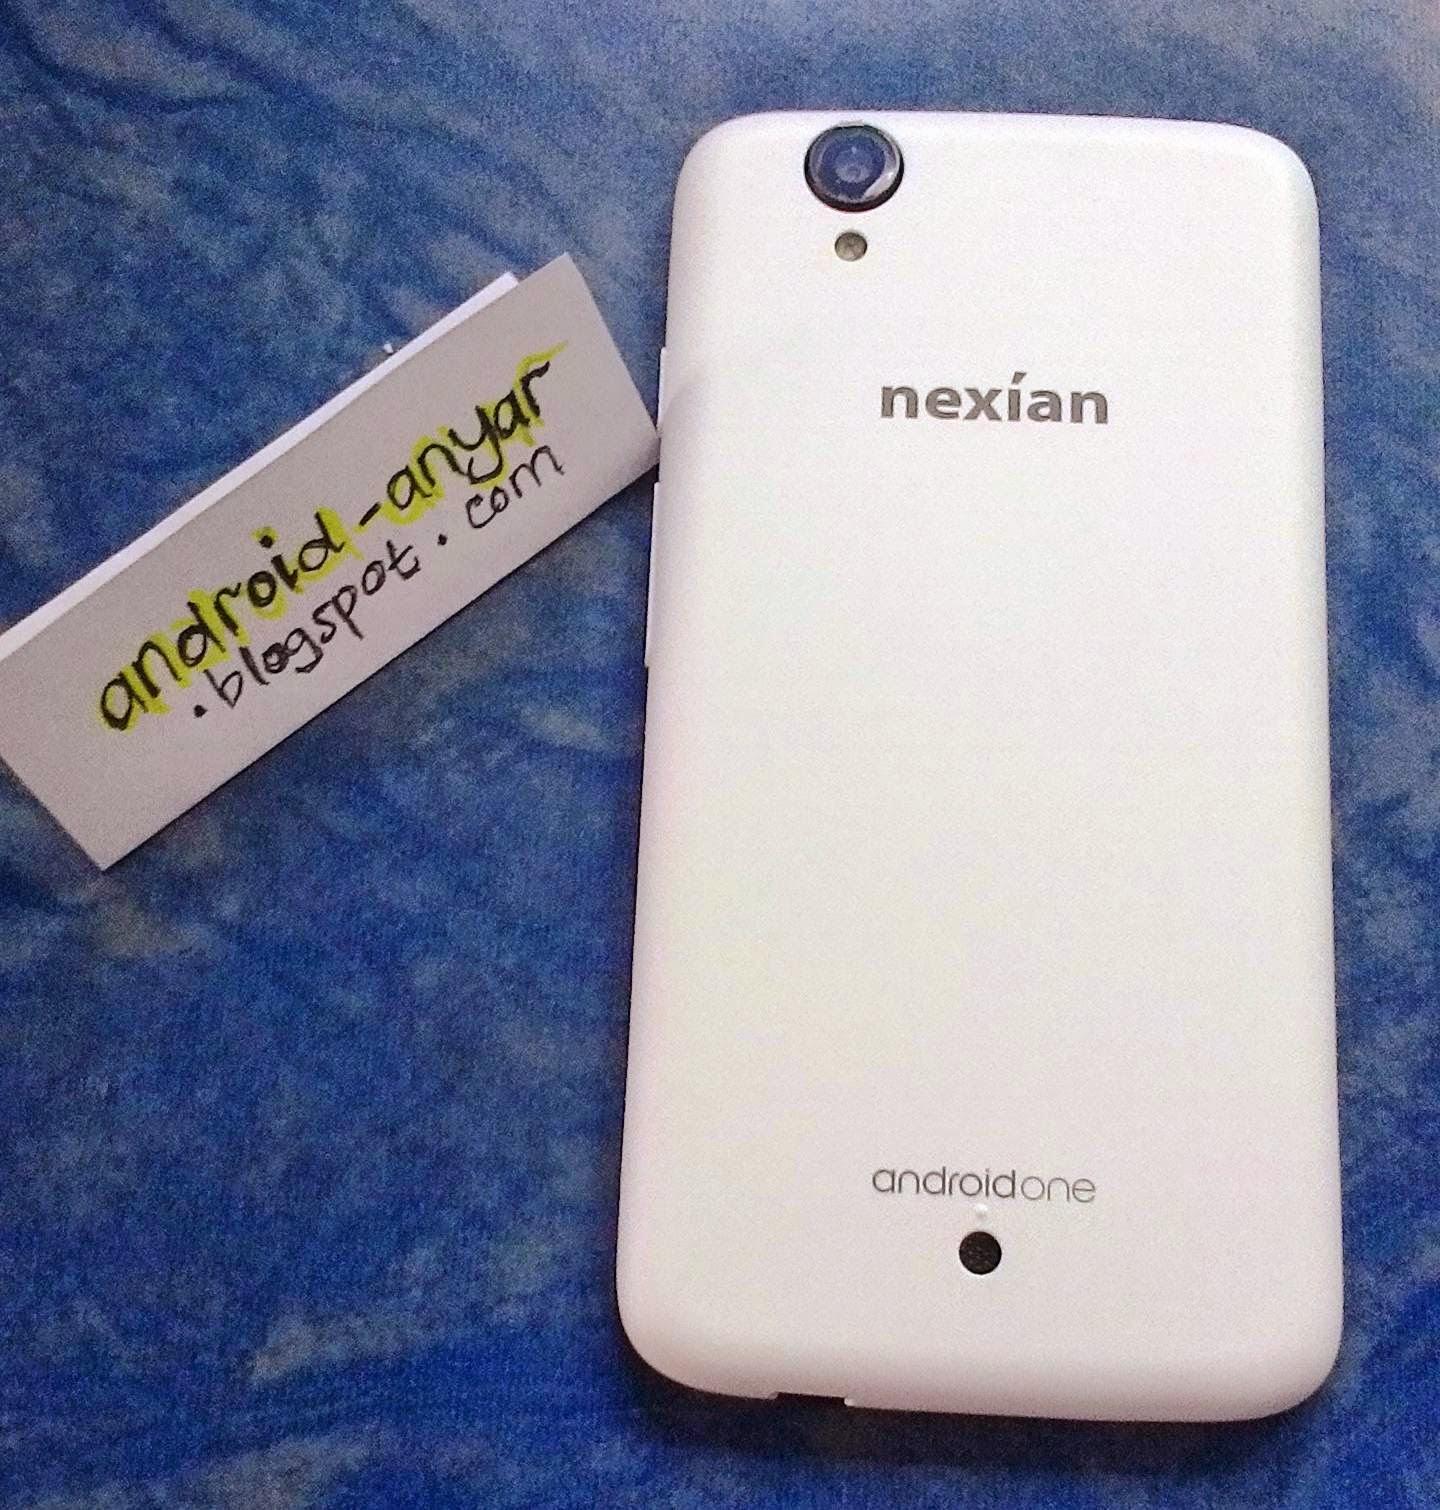 Tampak Belakang: AndroidOne Nexian Casing tidak licin